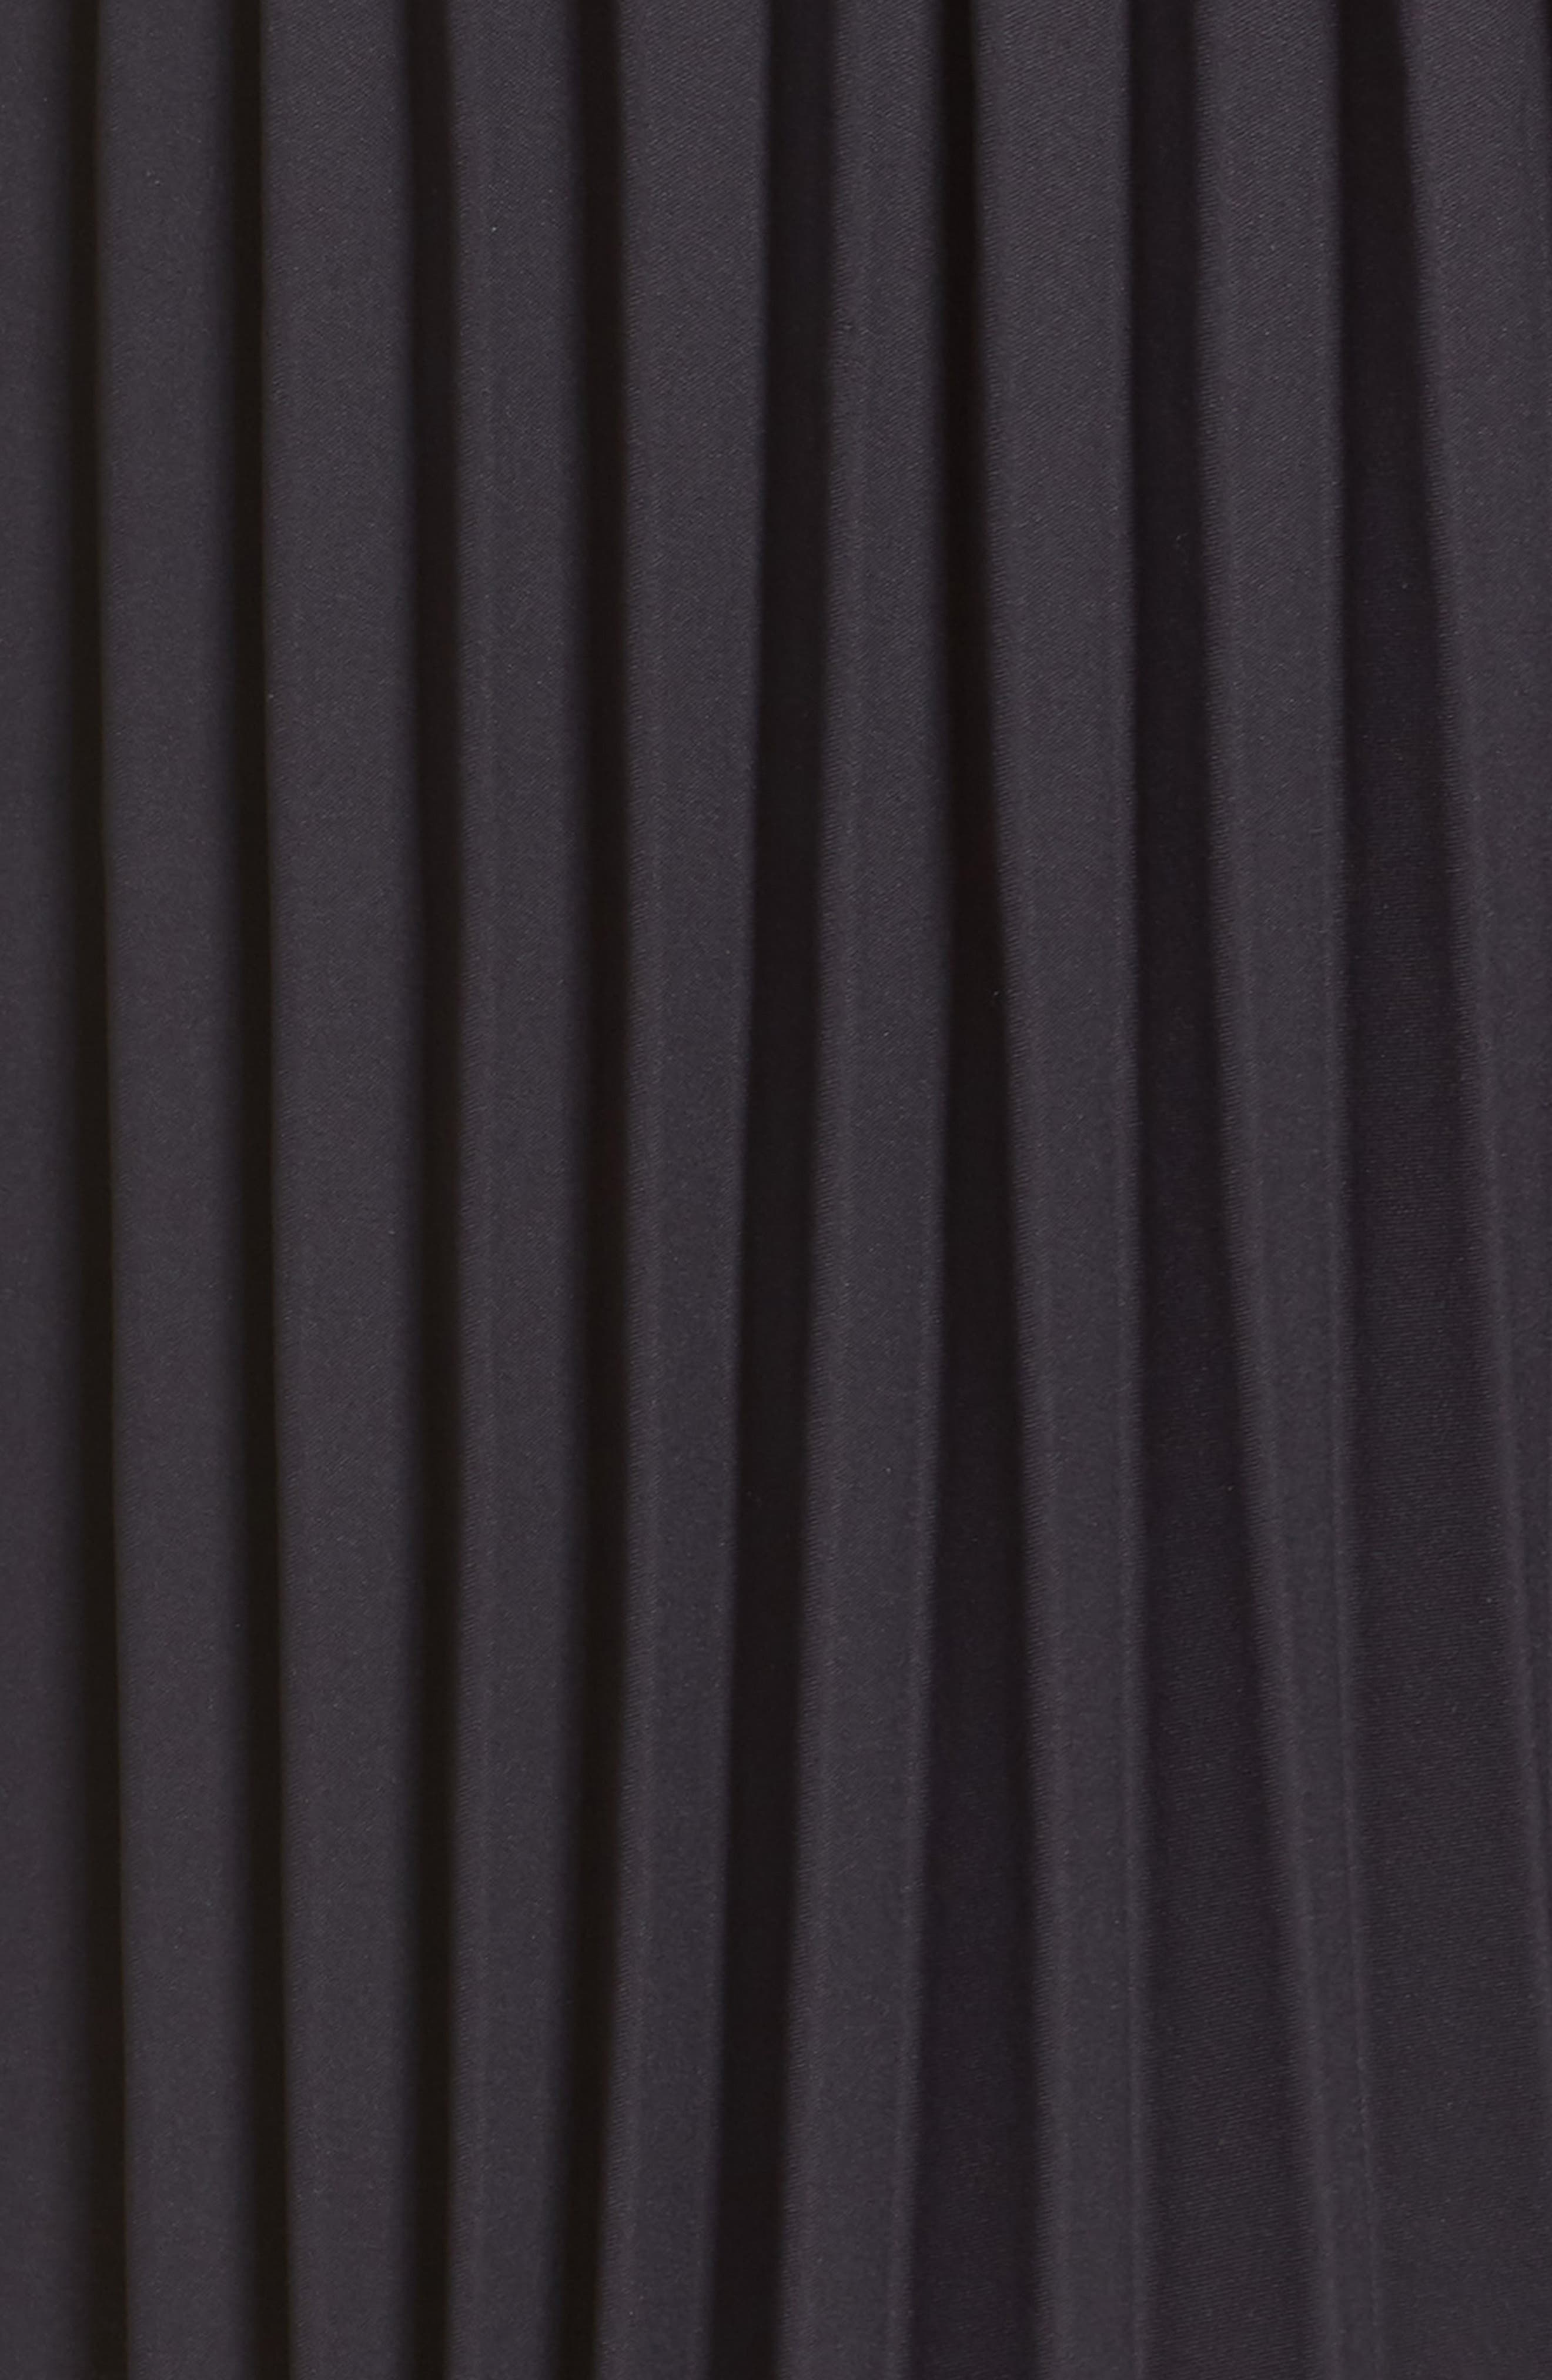 Free People Zephyr Shorts,                             Alternate thumbnail 6, color,                             Black